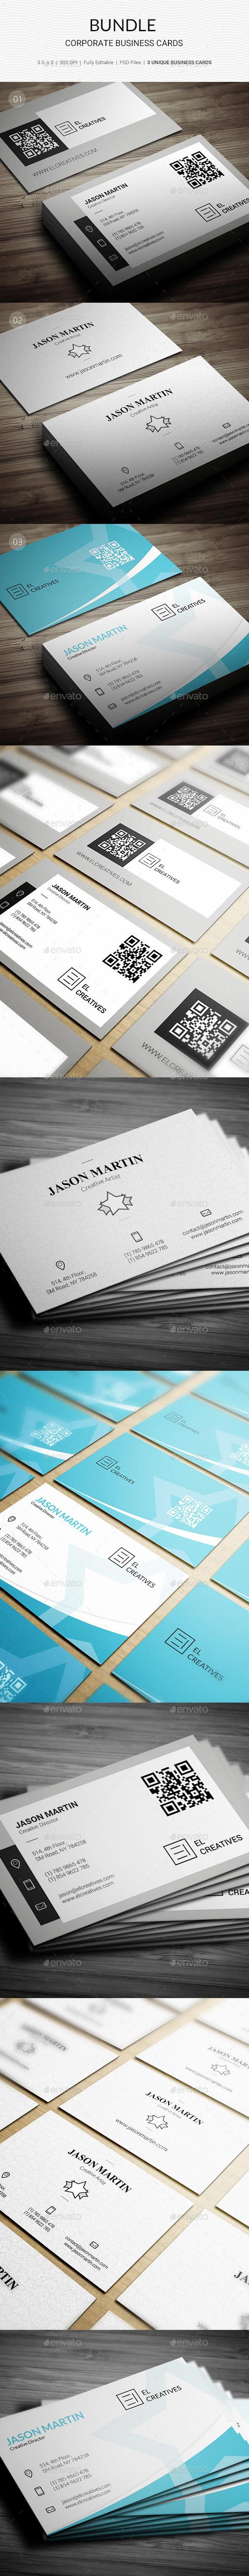 Bundle - Corporate Business Cards - 158 - Corporate Business Cards